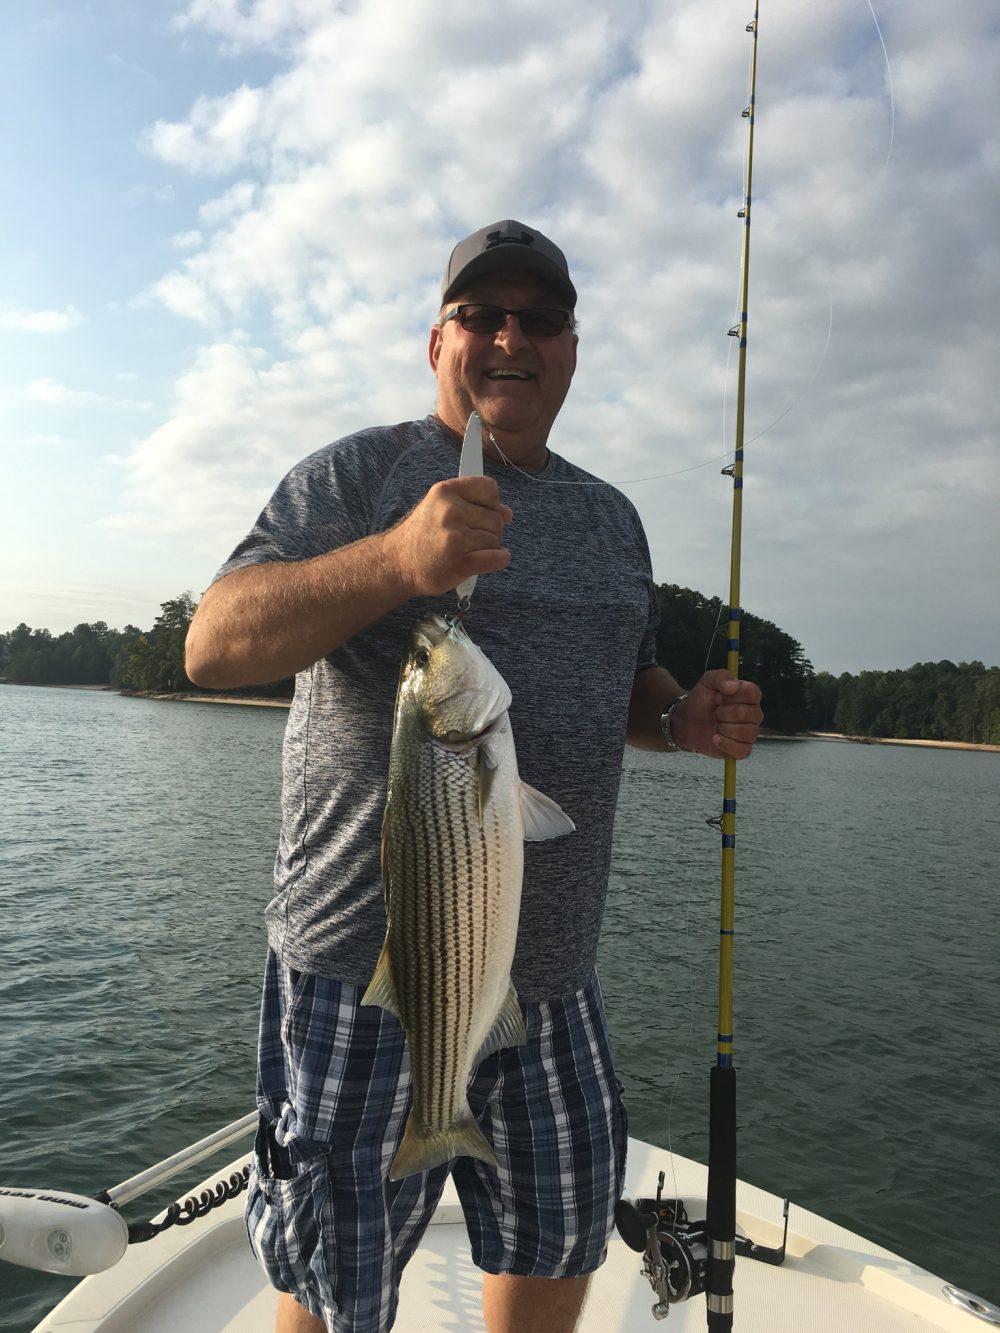 Lake lanier fishing report october 13 2016 captain mack 39 s for Fishing report lake lanier